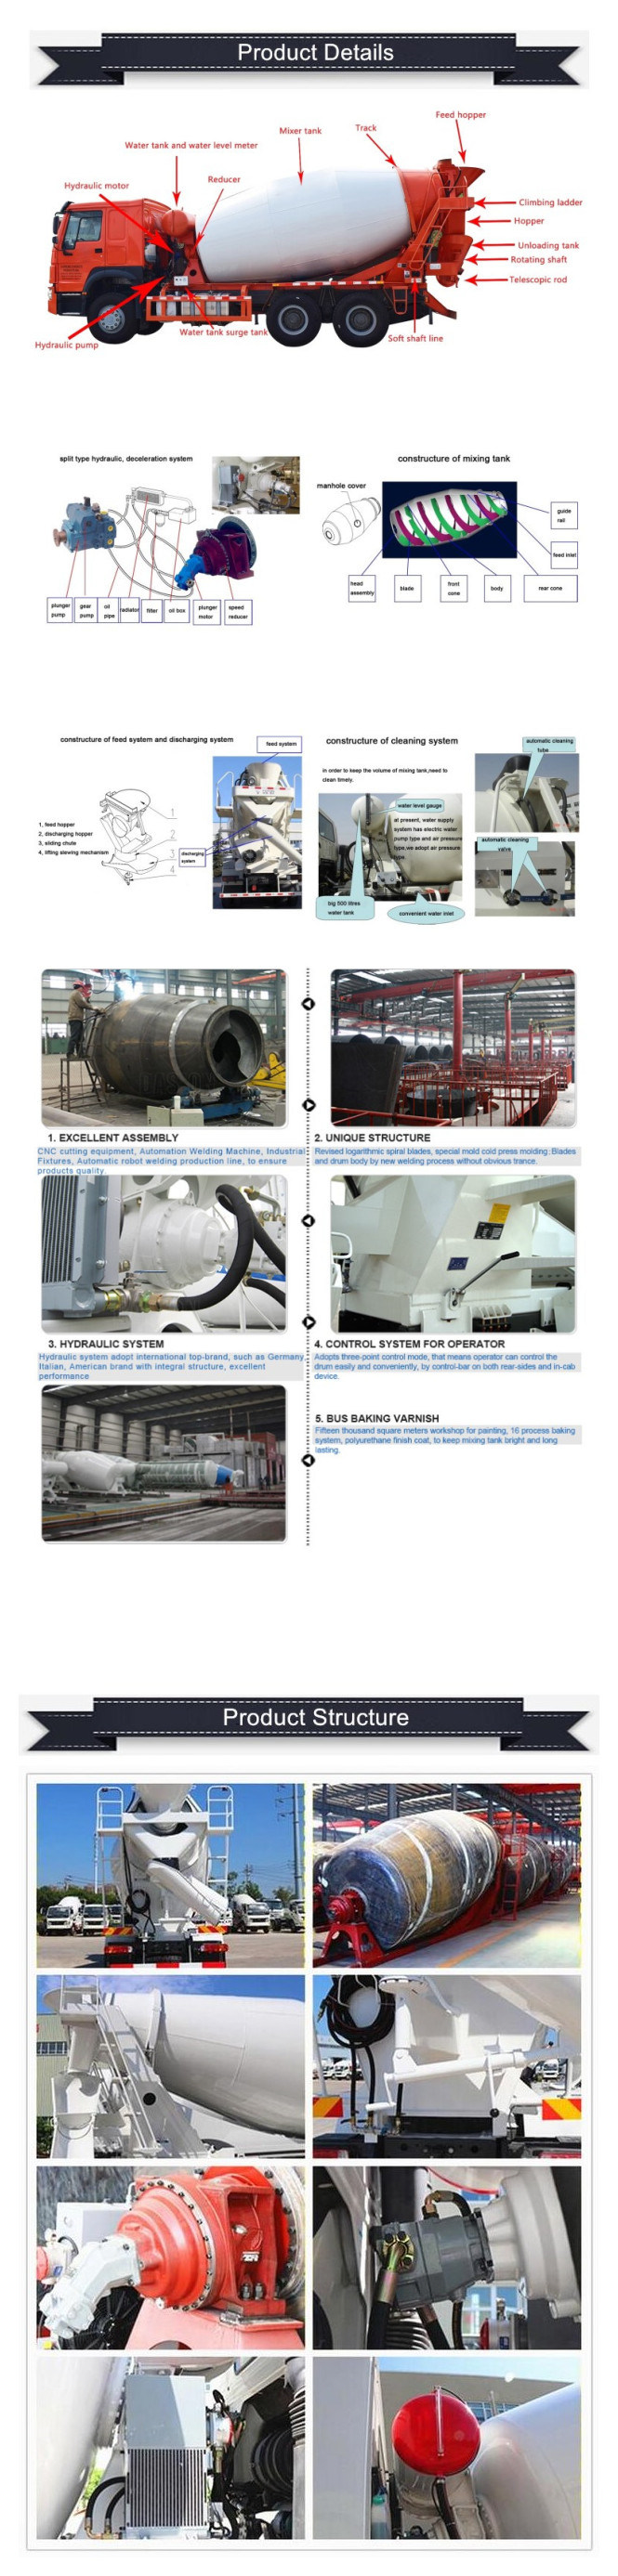 China Hot Sale 16m3 16kl 16, 000L 16 000liters 16m3 Beiben 8X4 Concrete Mixer Truck Price